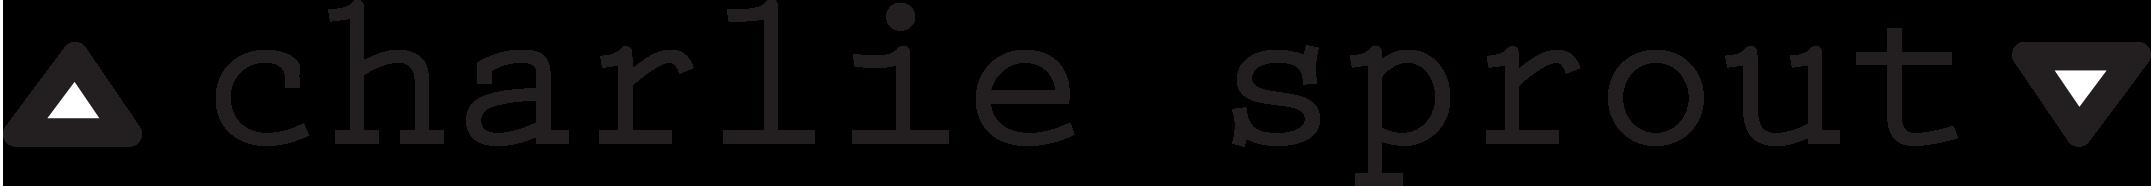 Charlie-Sprout-Logo-1-HI-RES.png